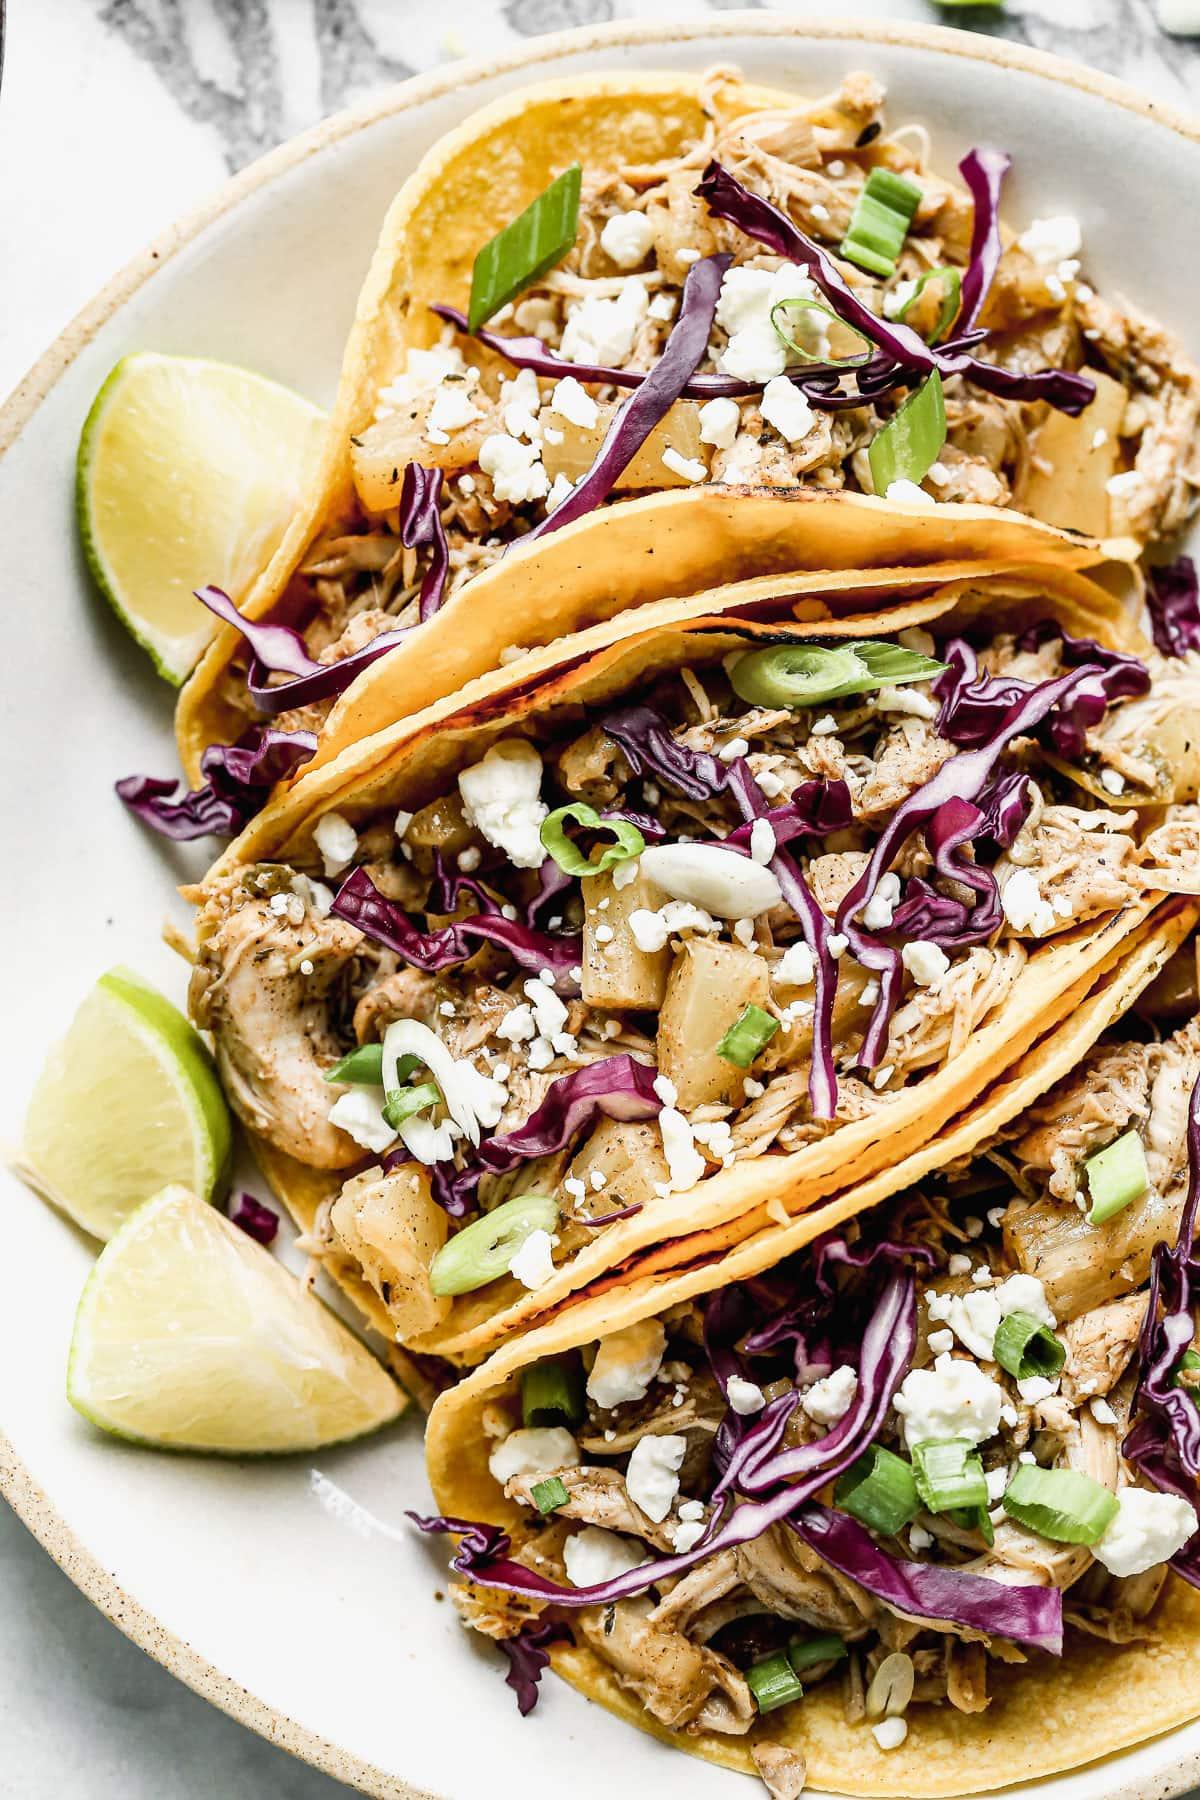 Three jerk chicken tacos on a plate